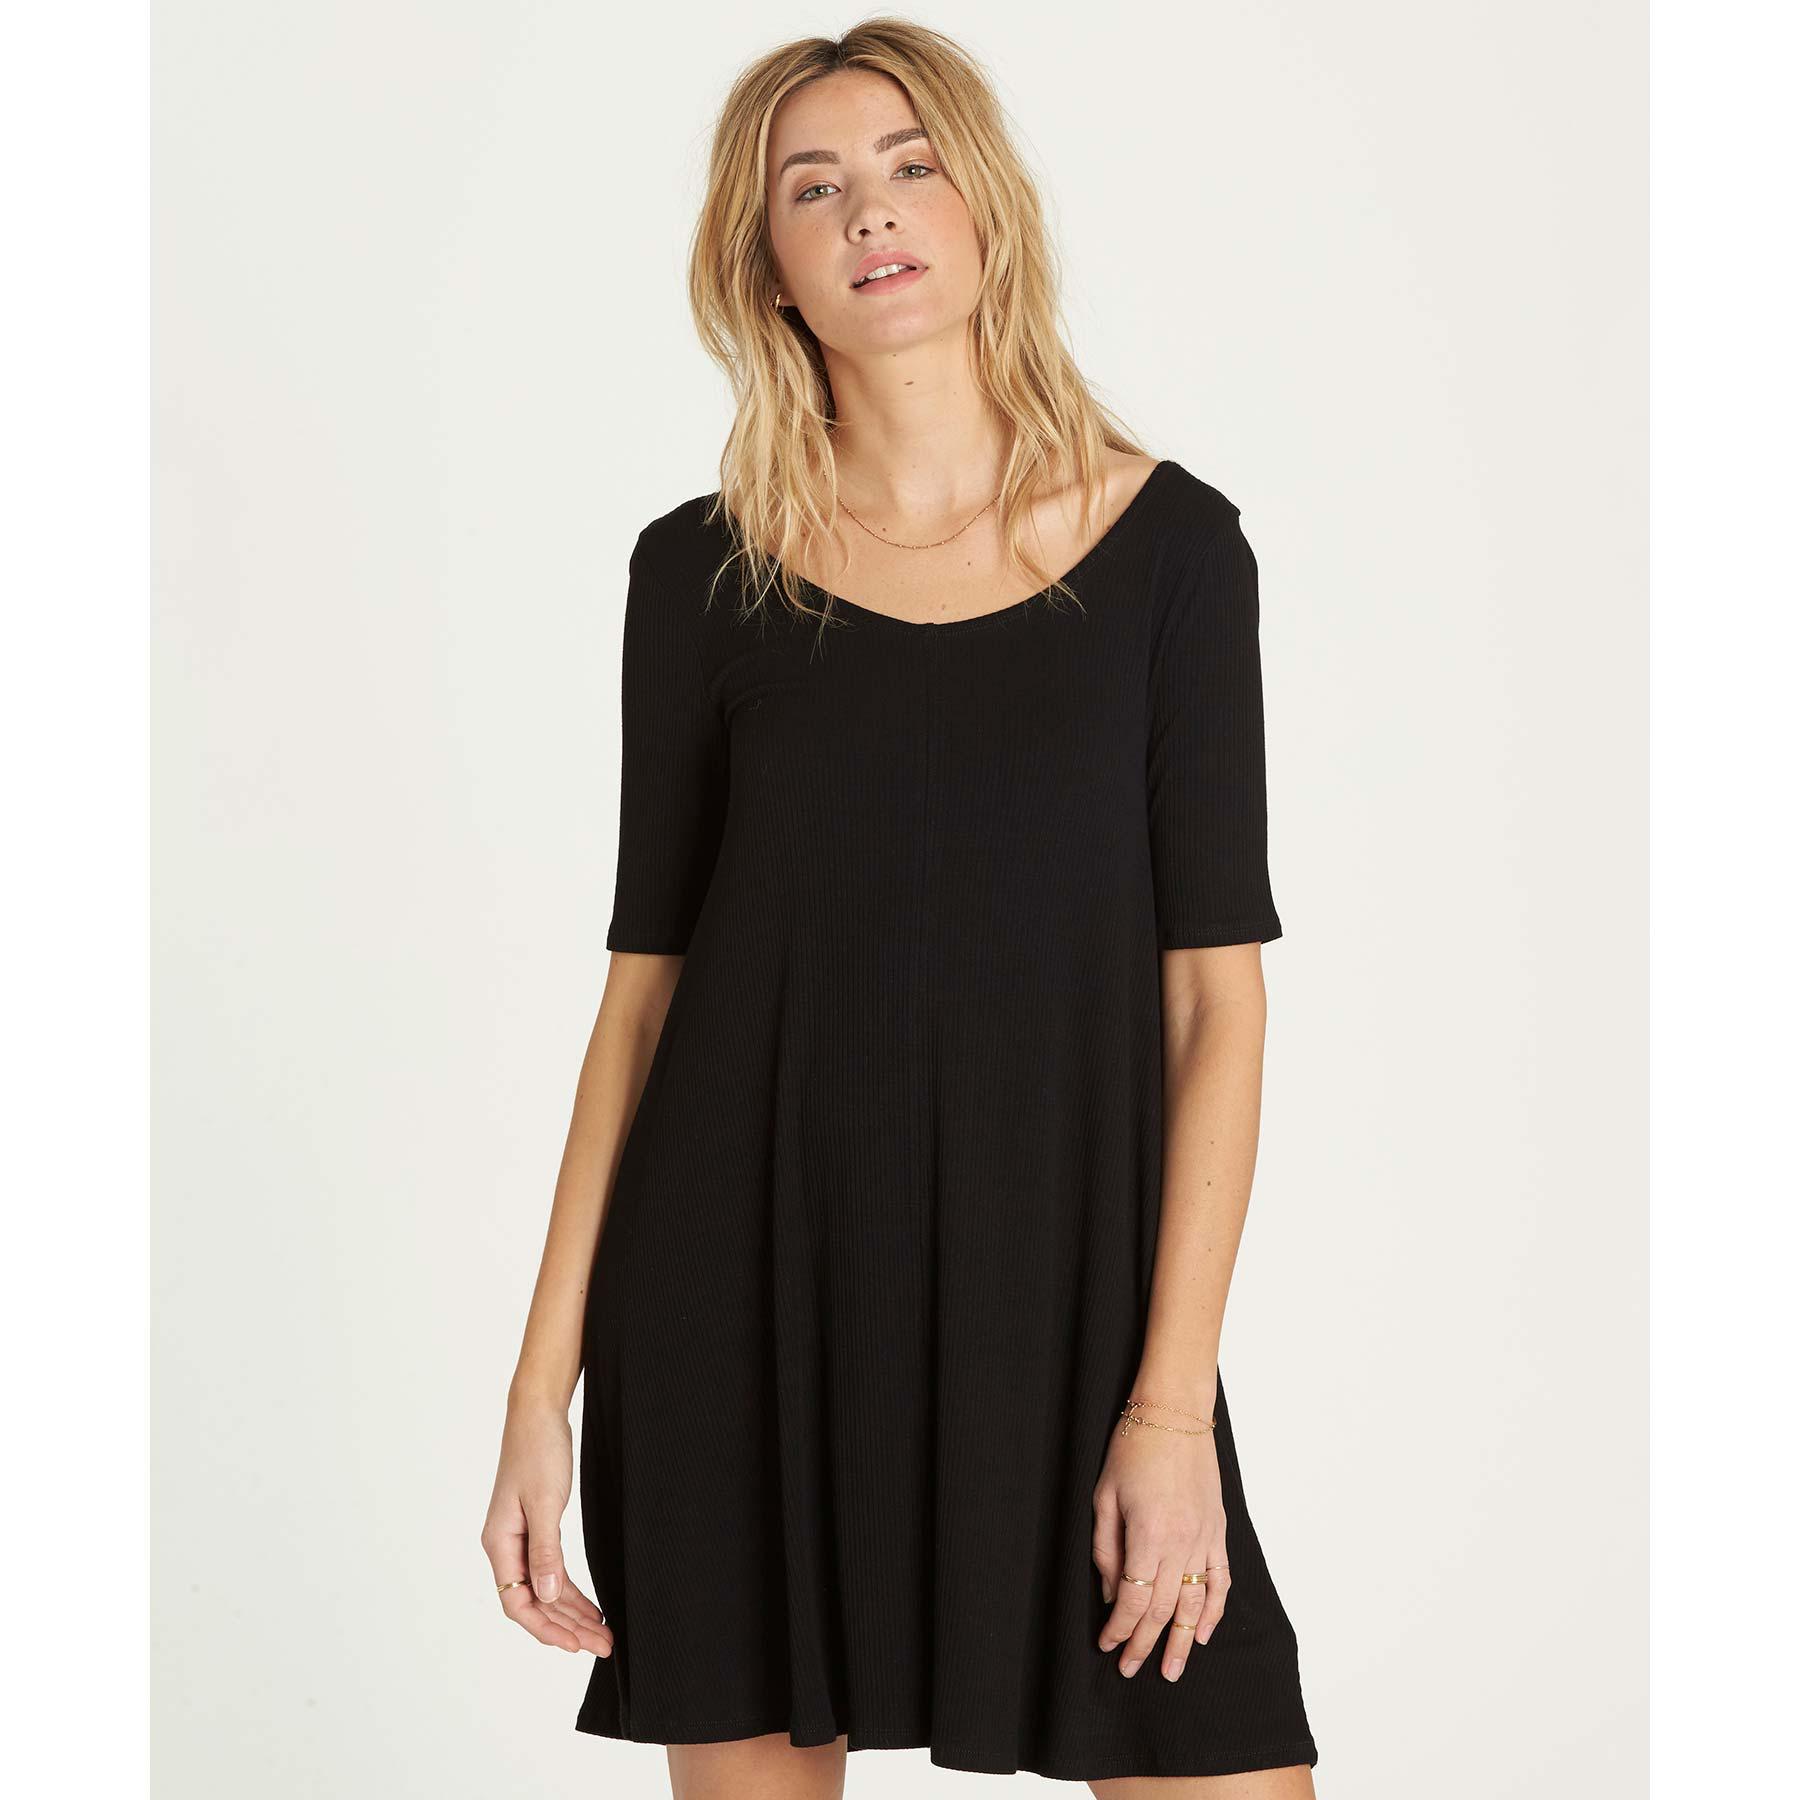 c822195580 Billabong Nothing To Hide Dress in Black - Lyst